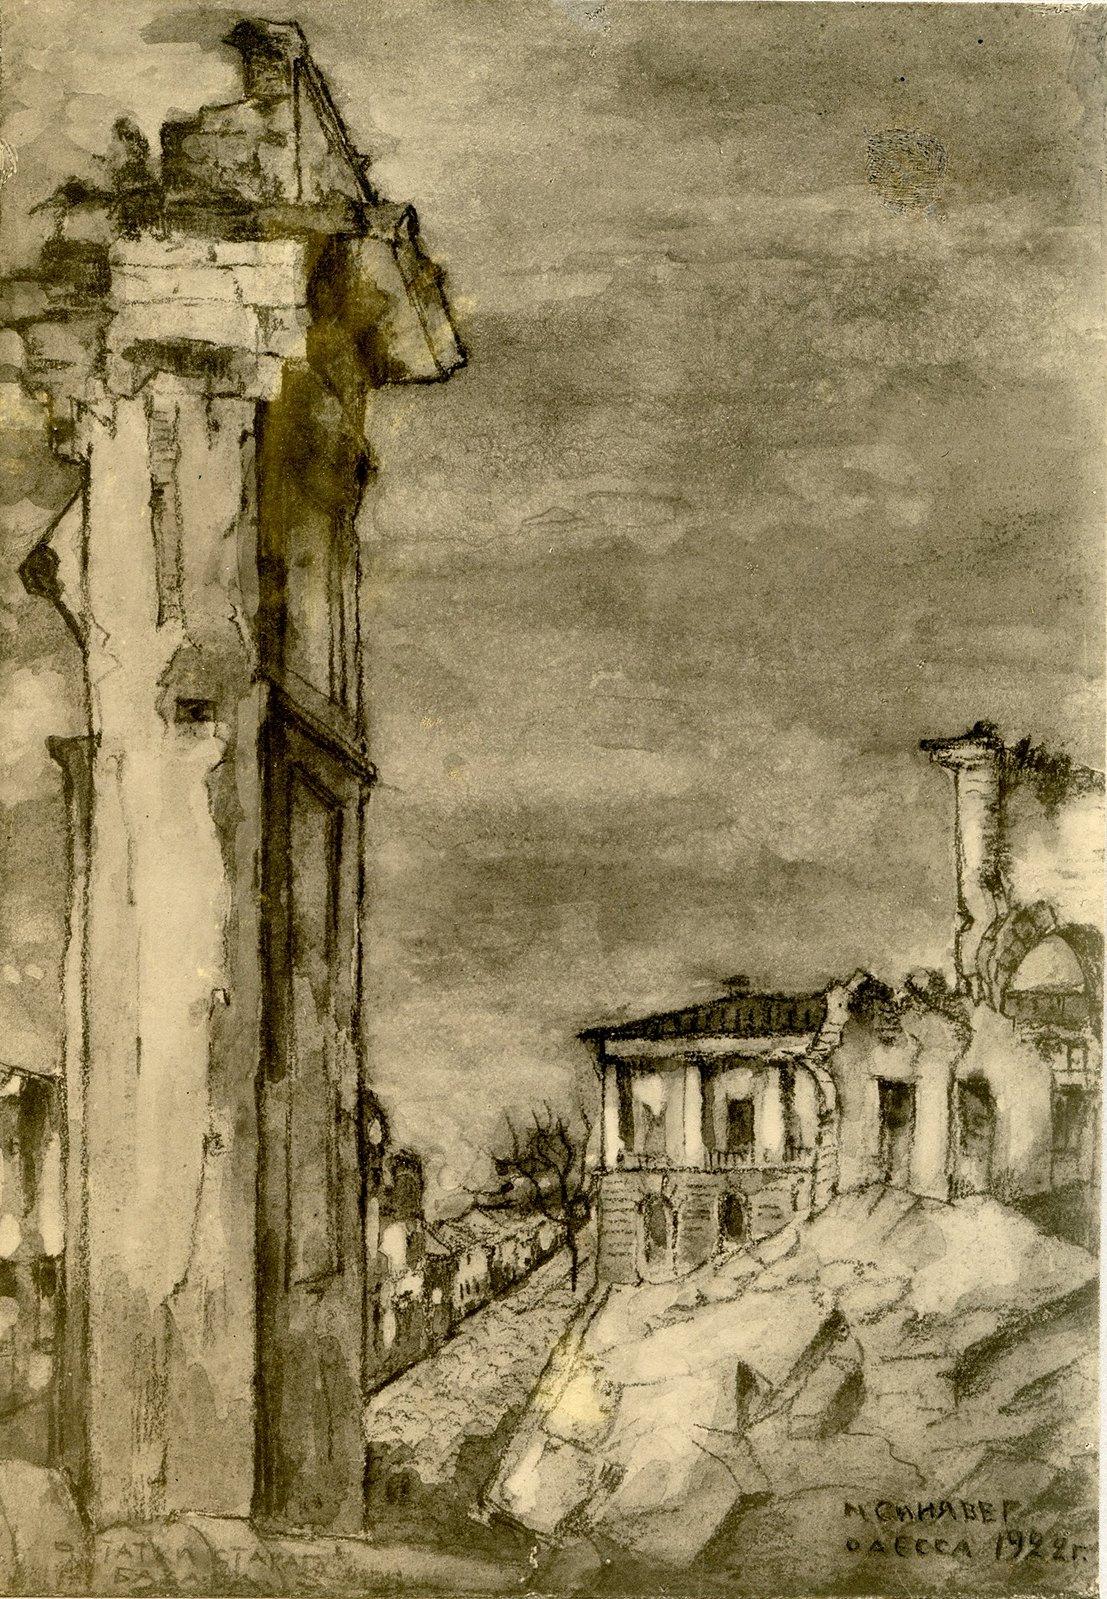 Руины старого базара на фоне дома построенного арх Камбиоджио